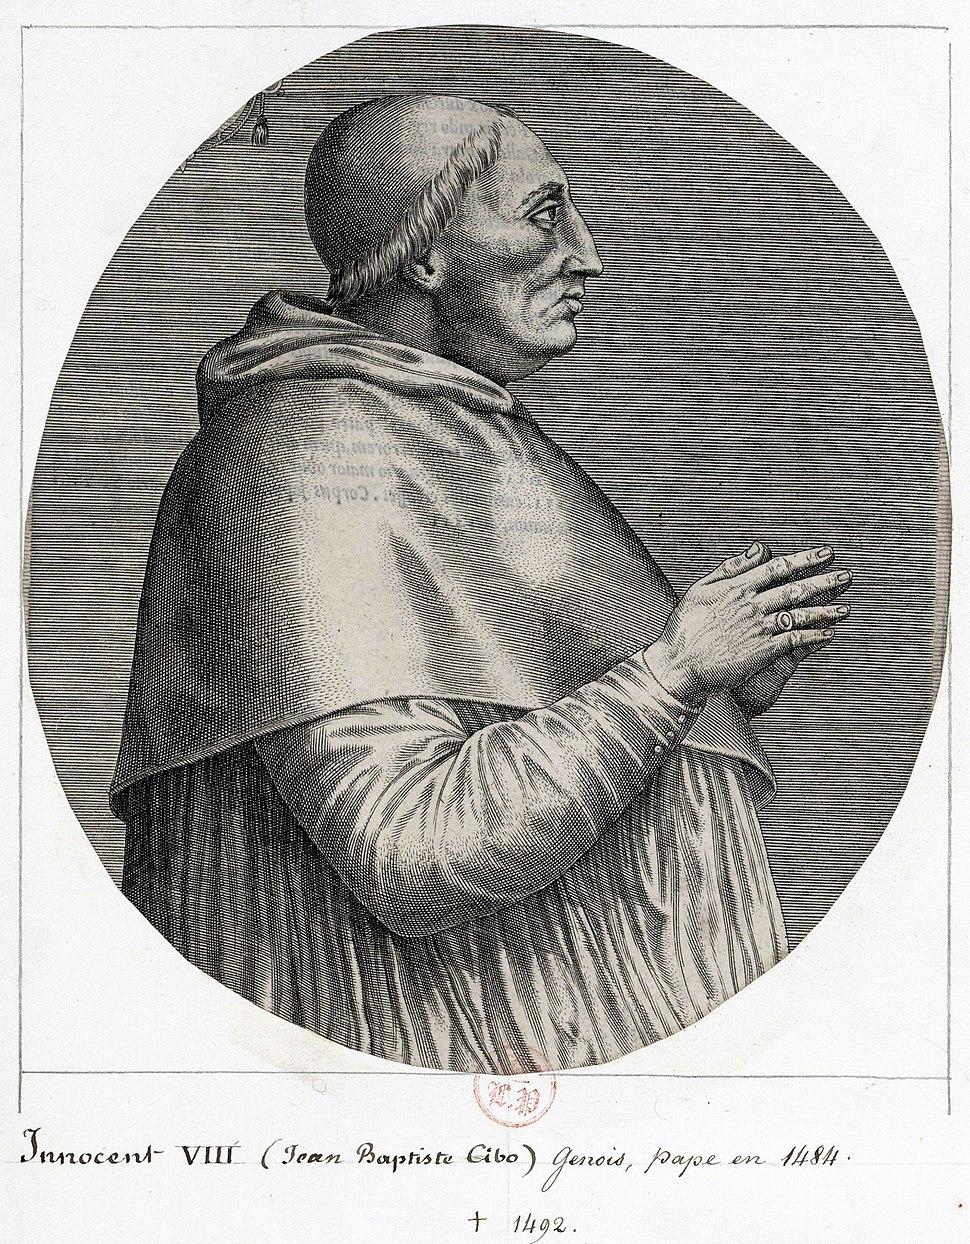 Innocent VIII 1492